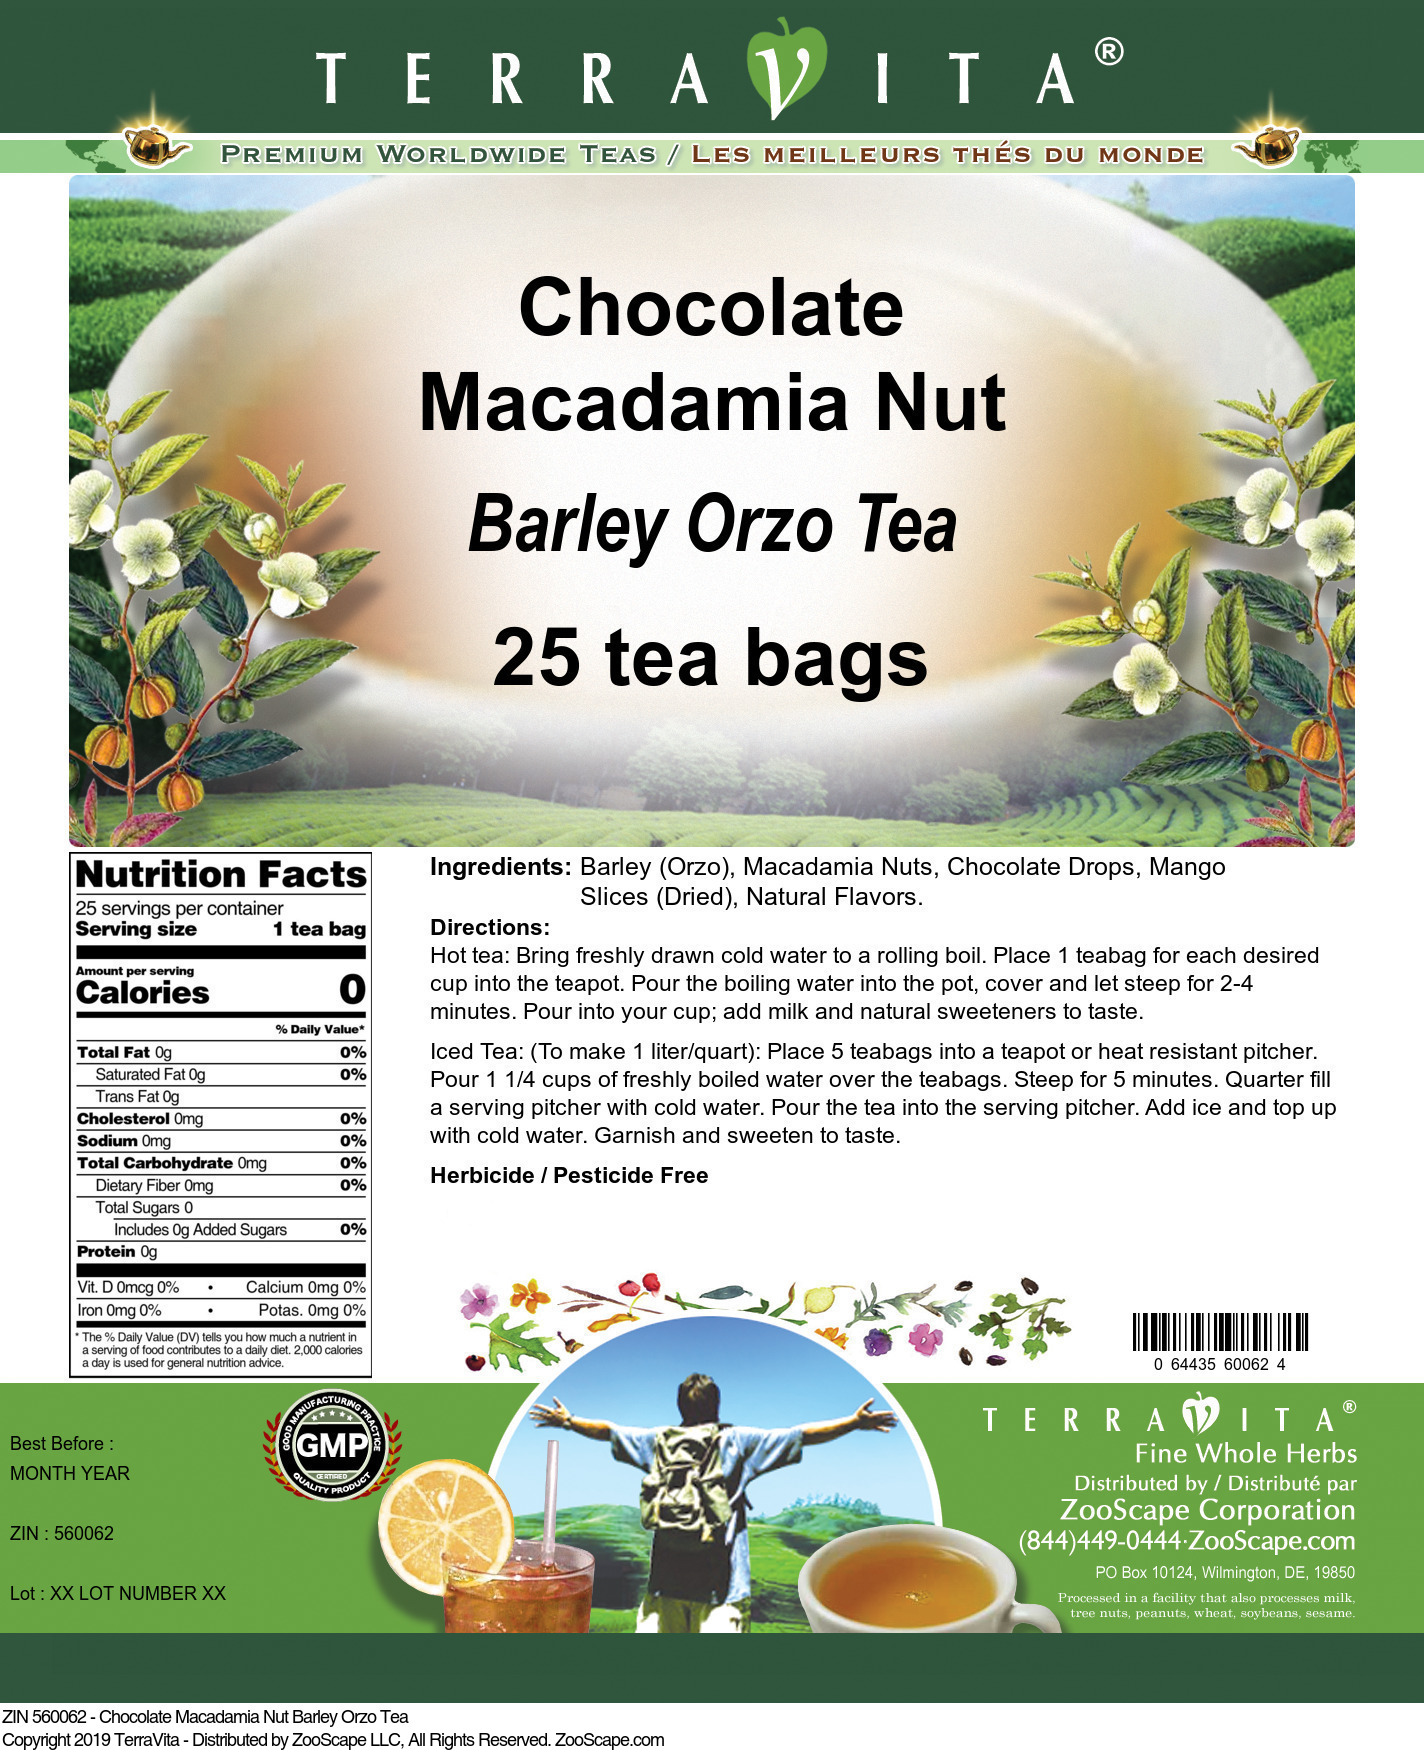 Chocolate Macadamia Nut Barley Orzo Tea